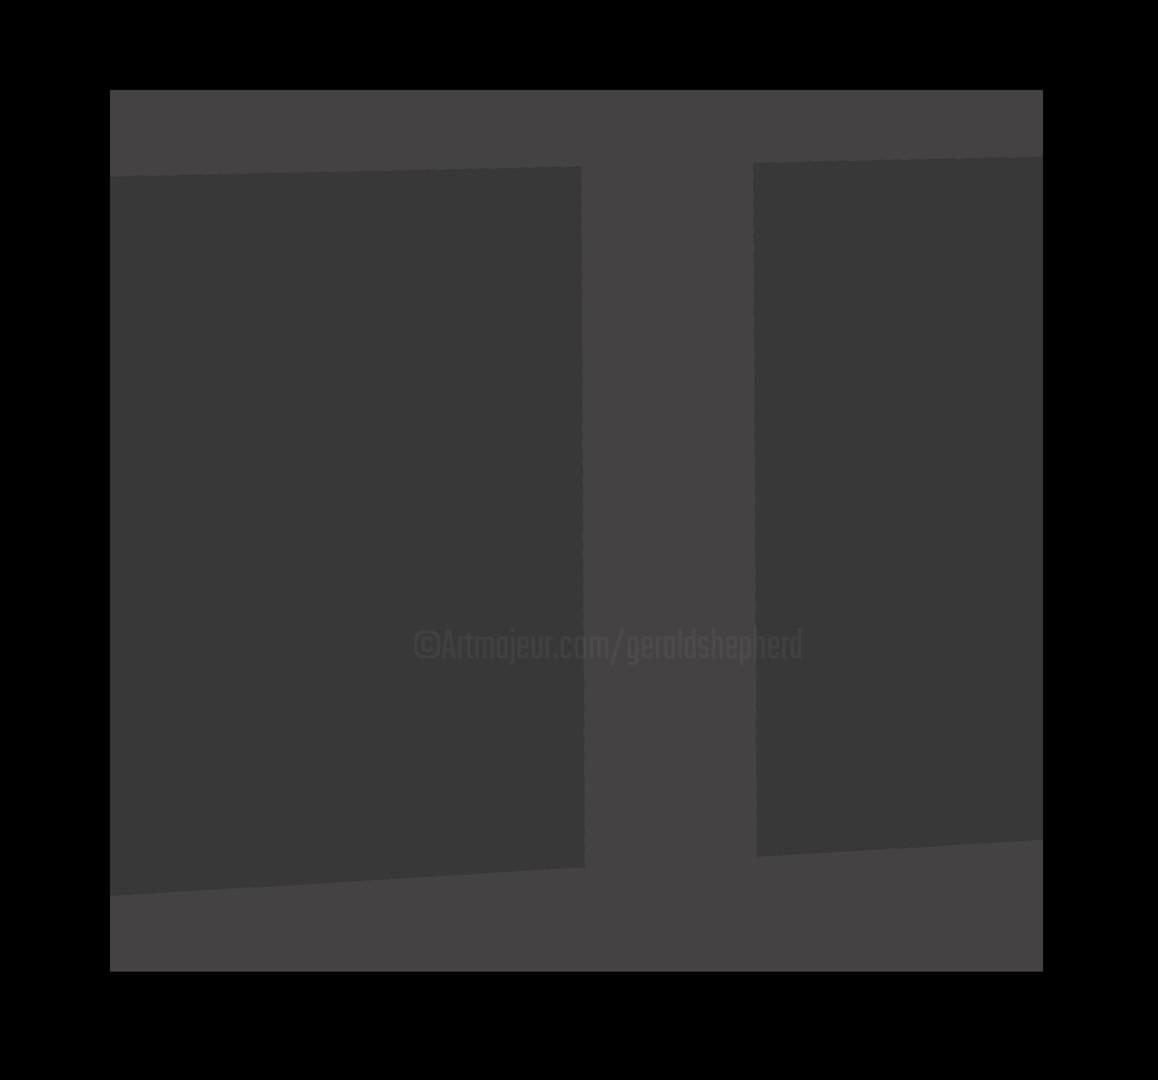 Gerald Shepherd - Simple Motif